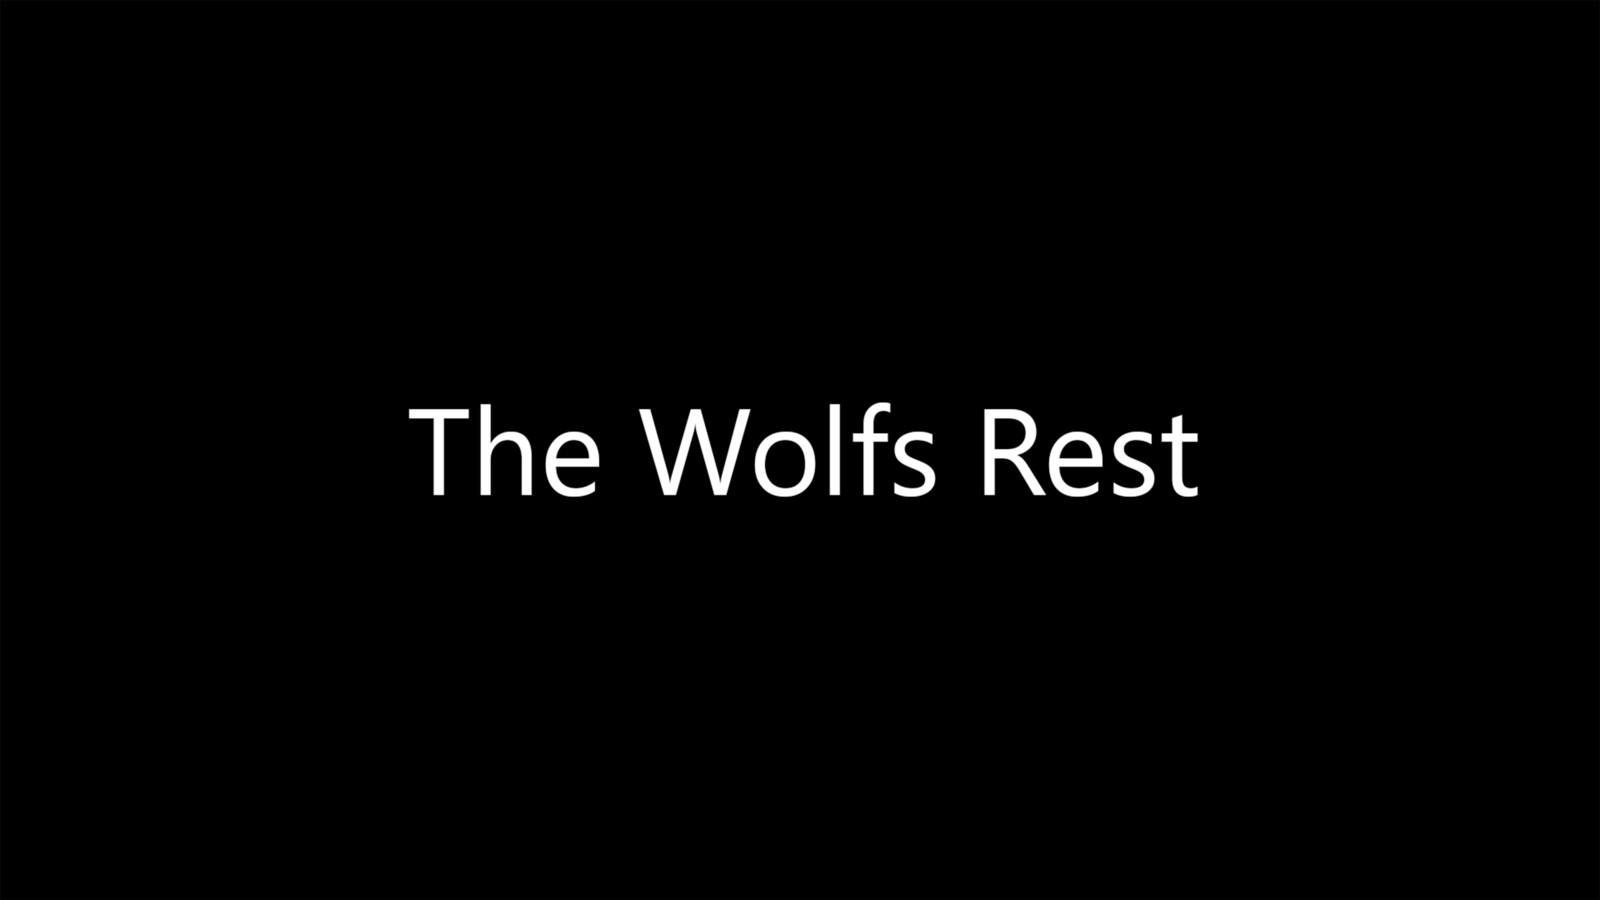 The Wolfs Rest